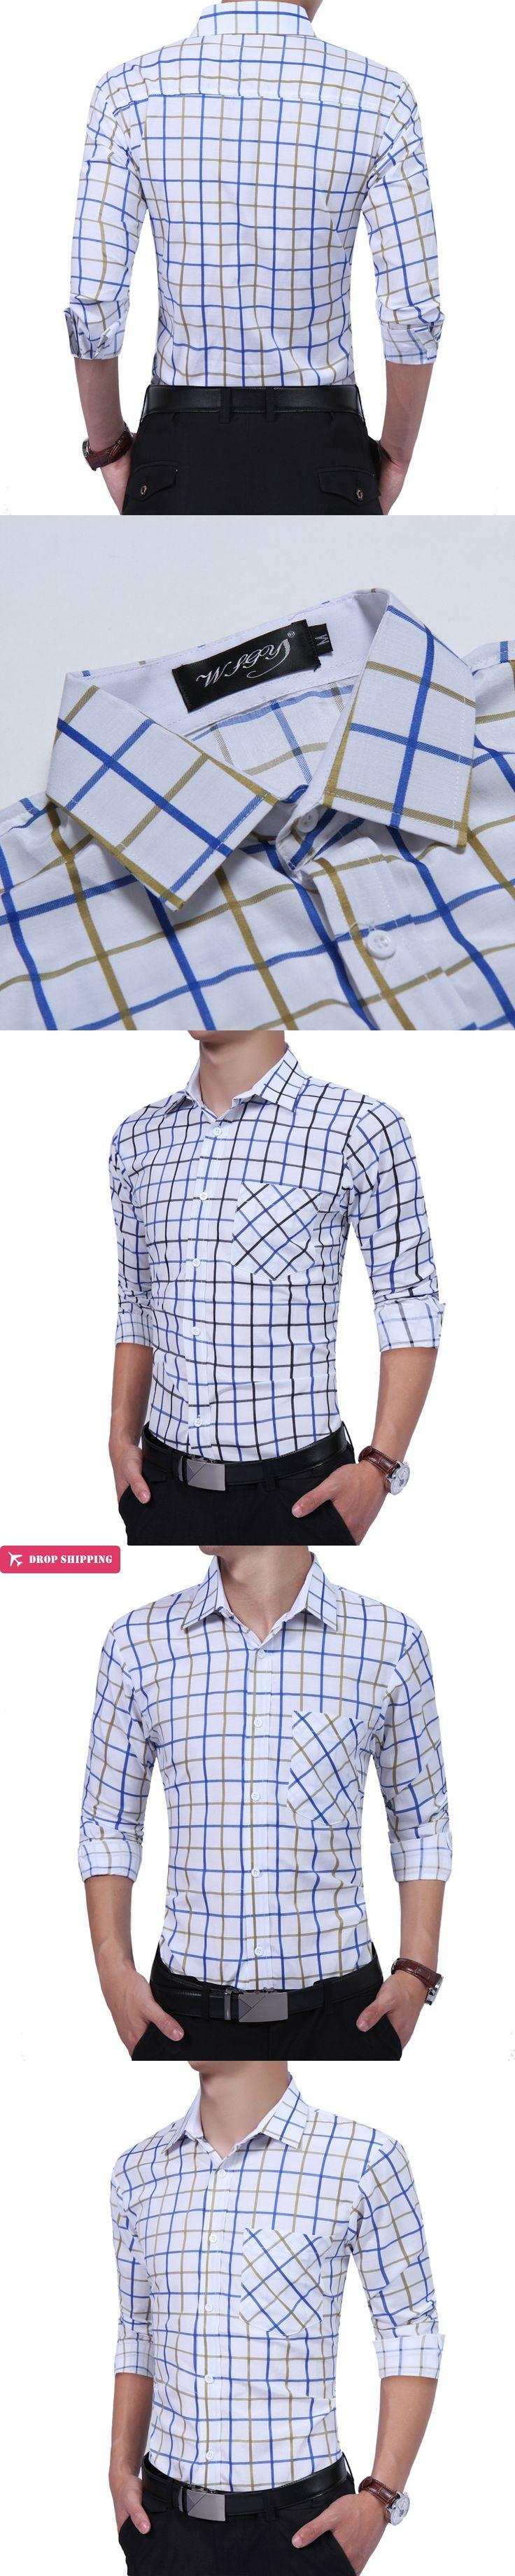 Men Dress Shirts 2017 Autumn Fashion Slim Fit Long Sleeve Man Plaid Casual Shirt Size XXL Camisa Masculina